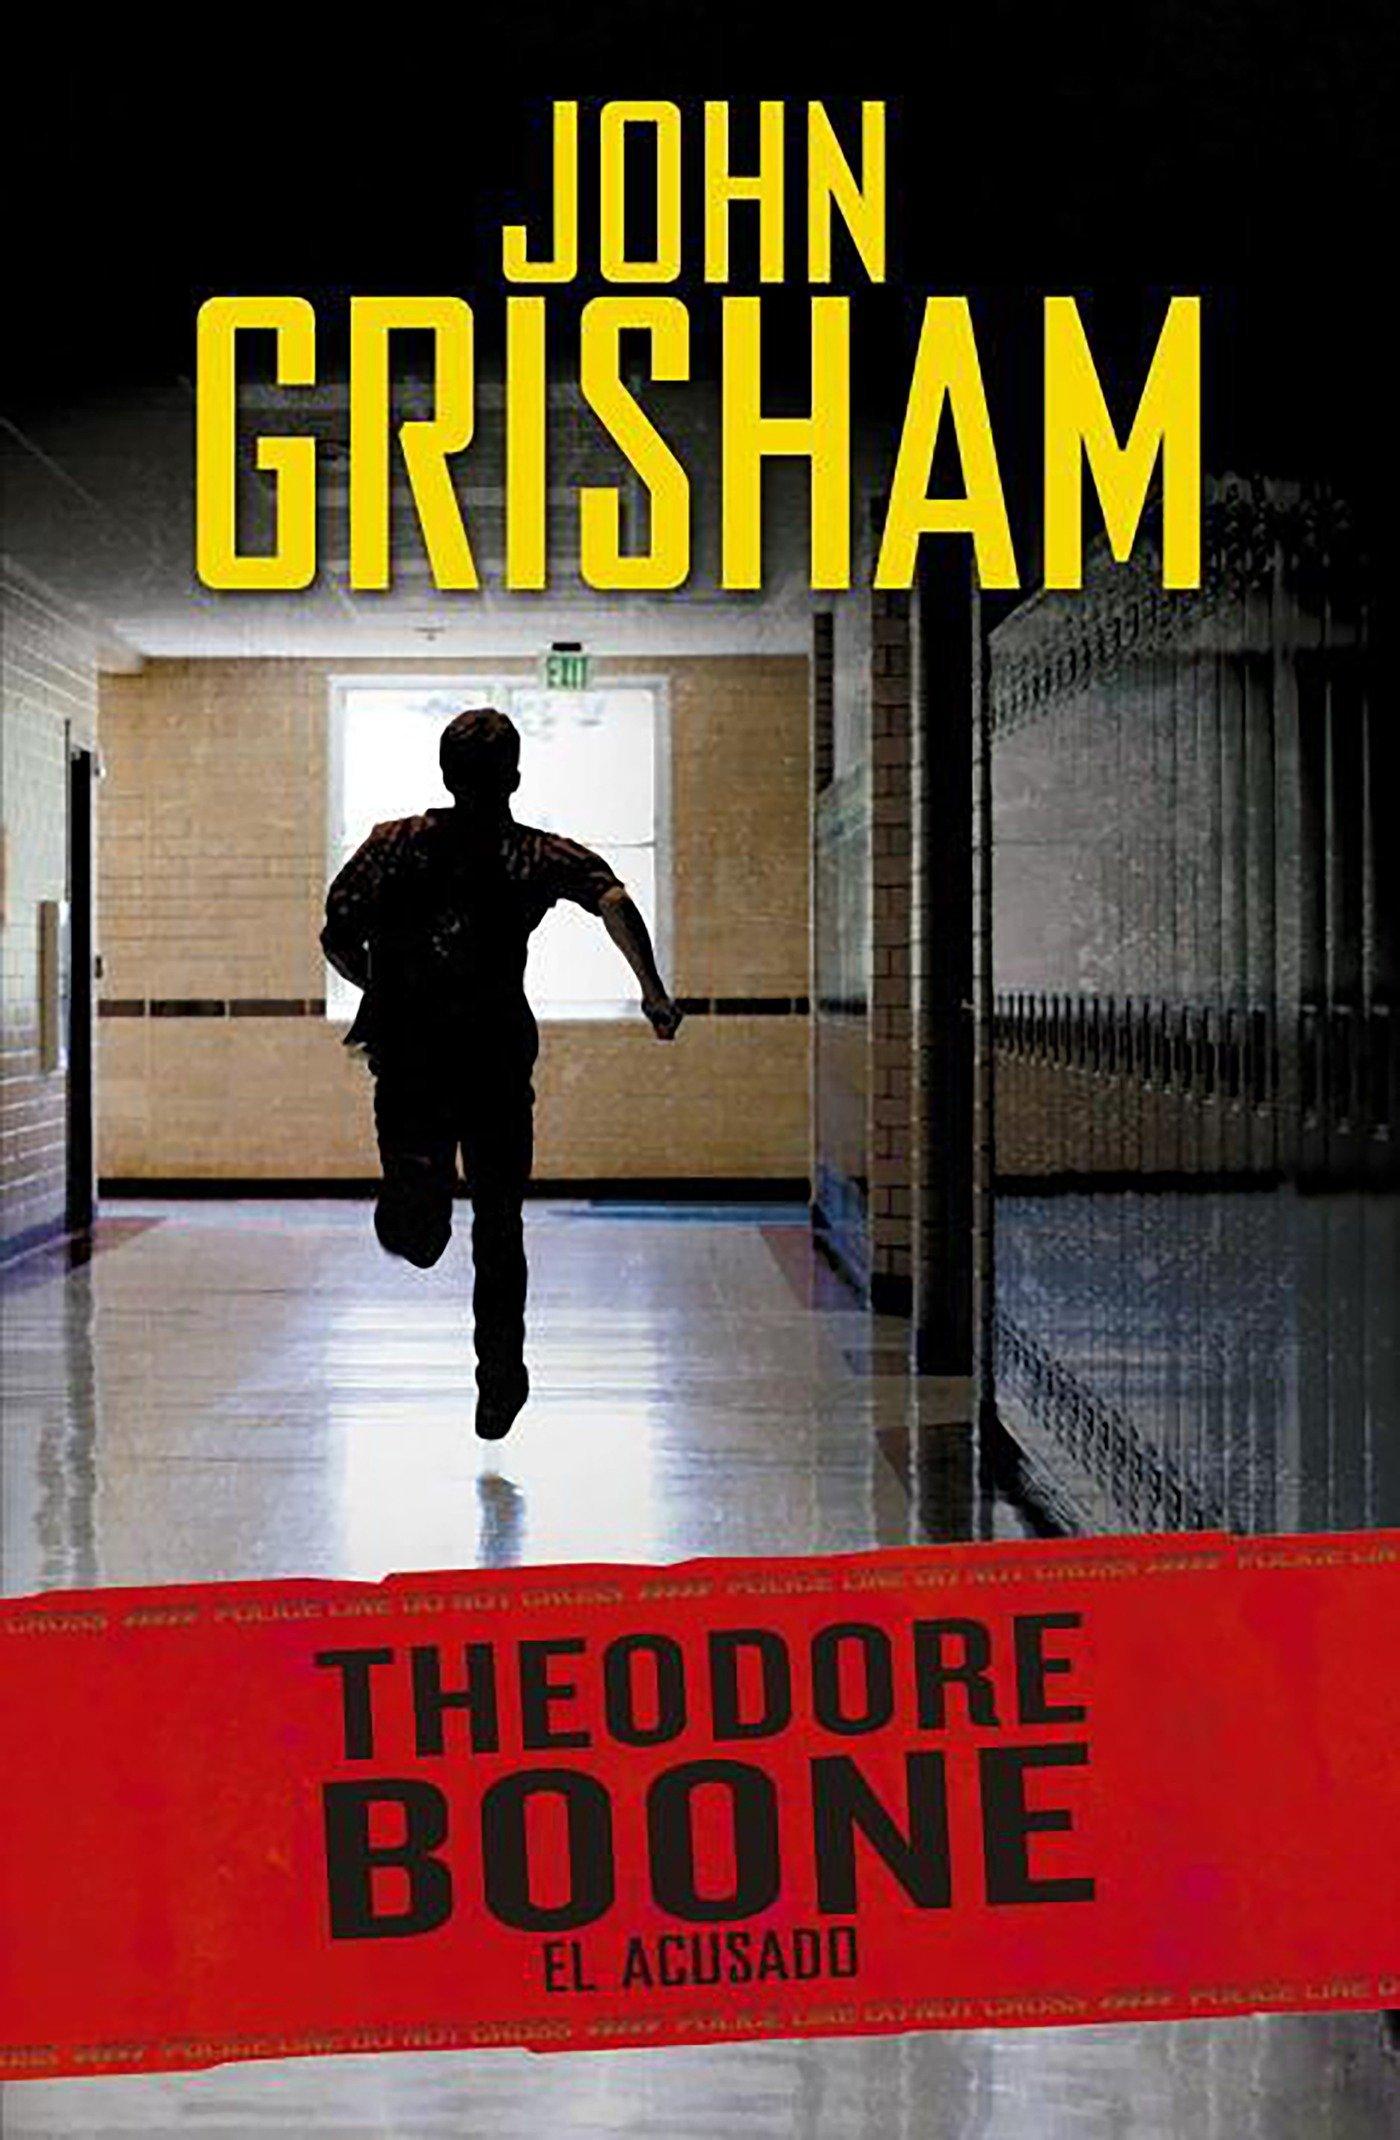 EL acusado (Spanish Edition): John Grisham: 9786073121019: Amazon.com: Books